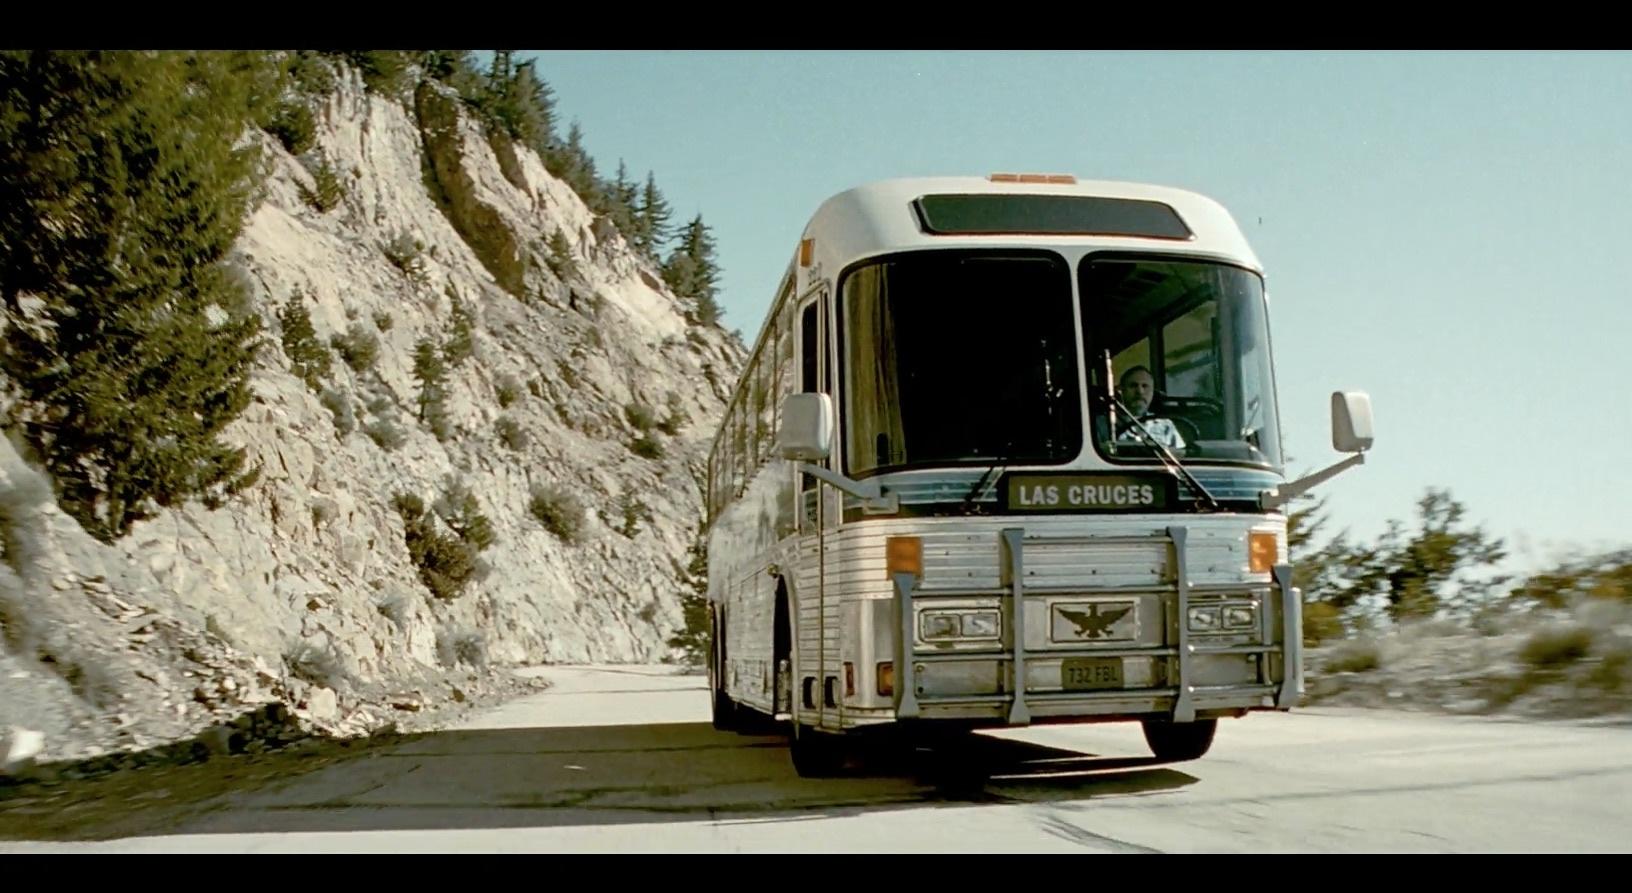 Thumbnail for Bus